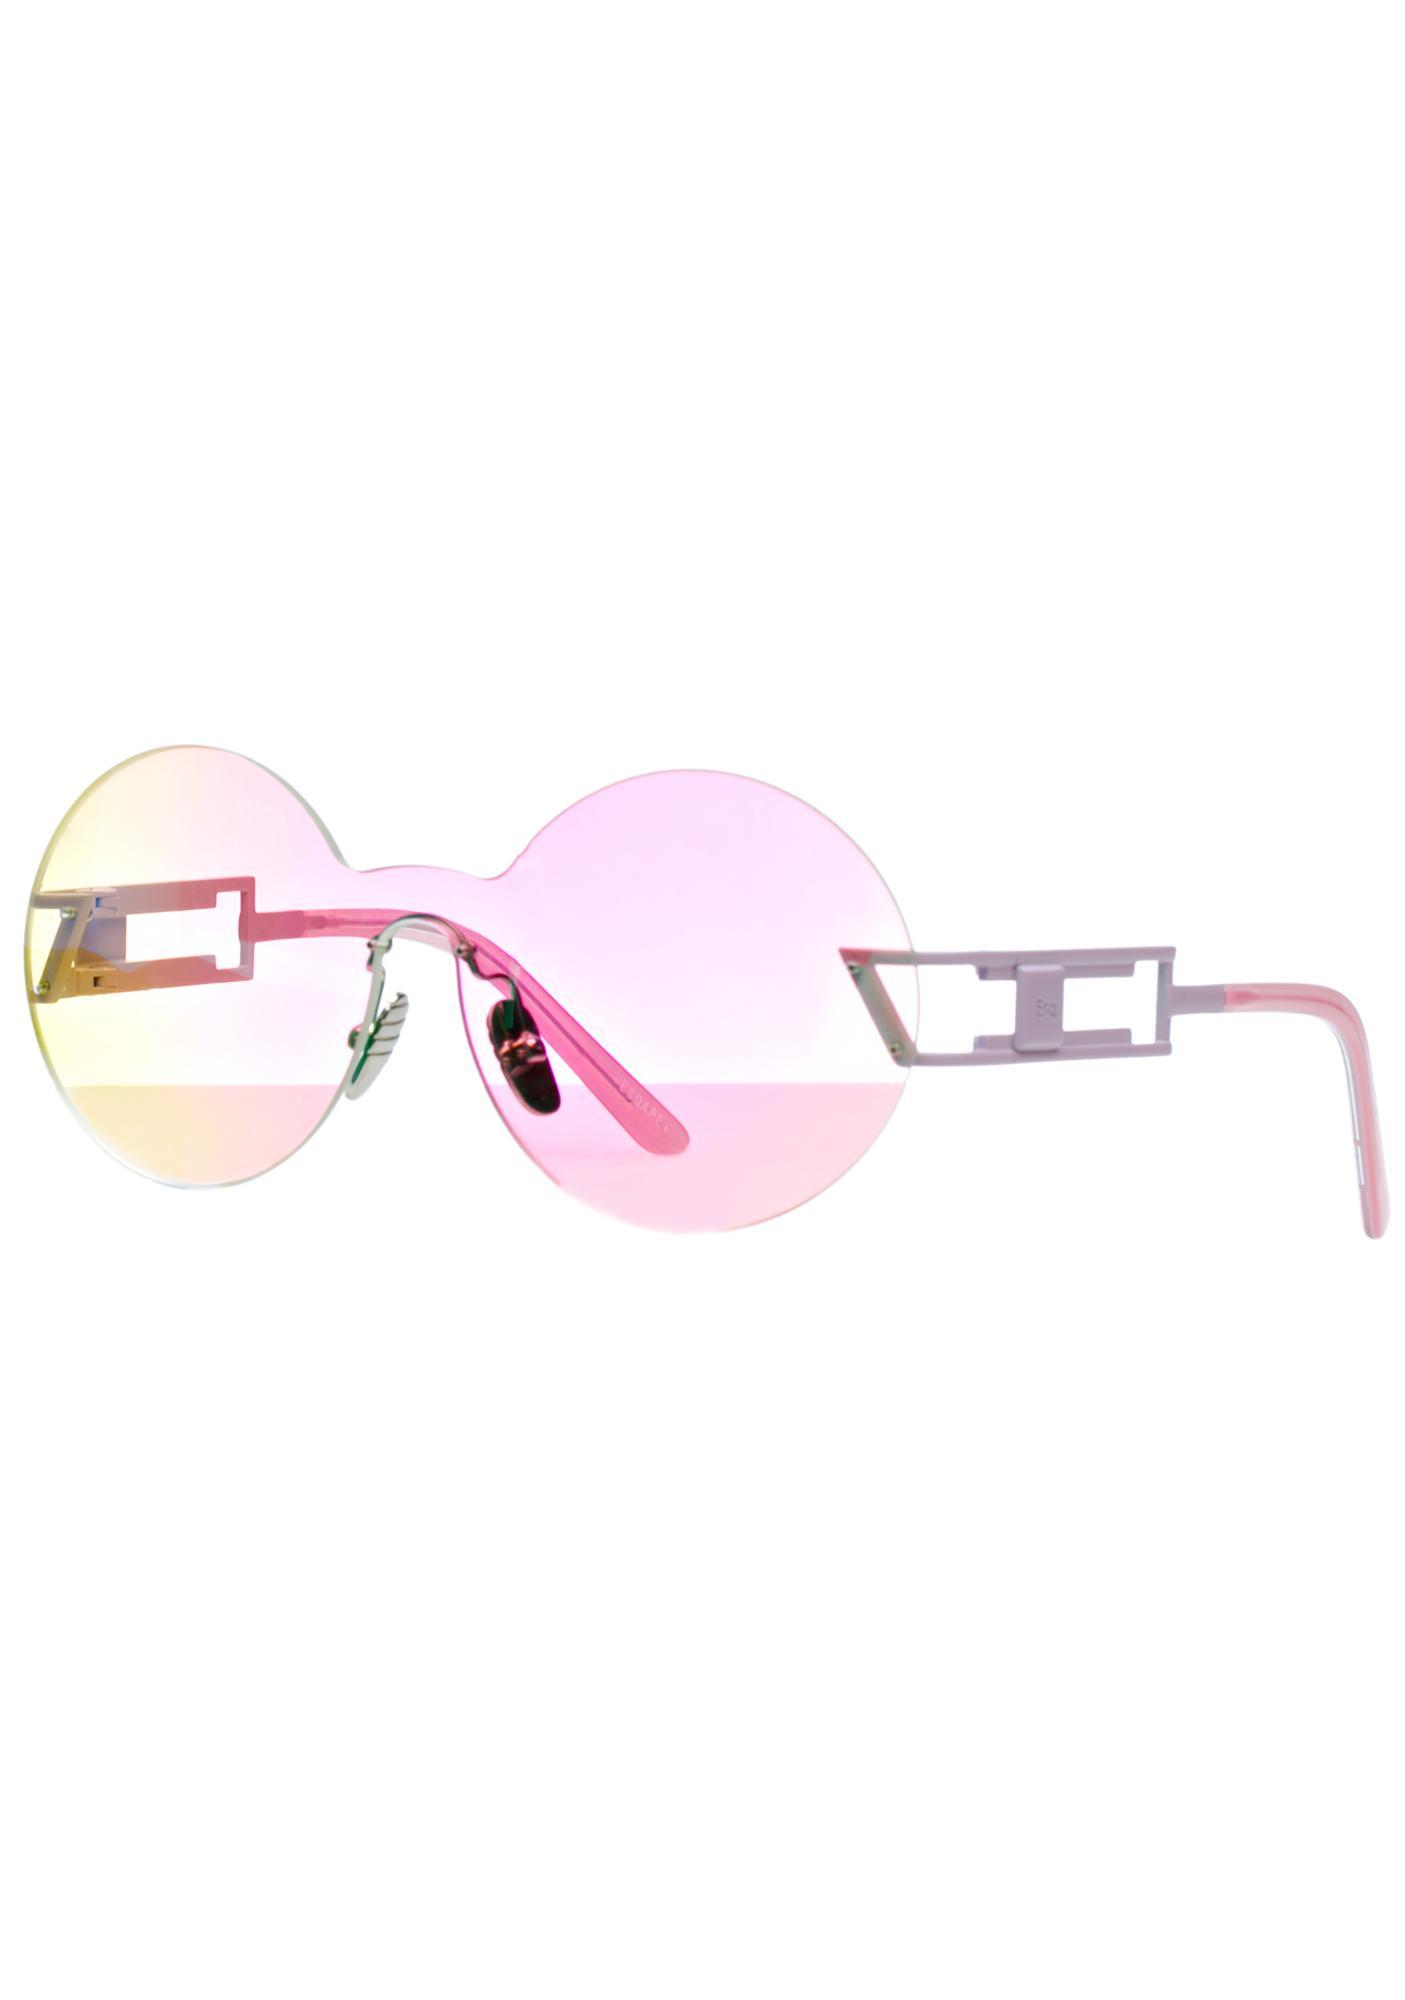 ESQAPE Seemore Pink Hologram Sunglasses